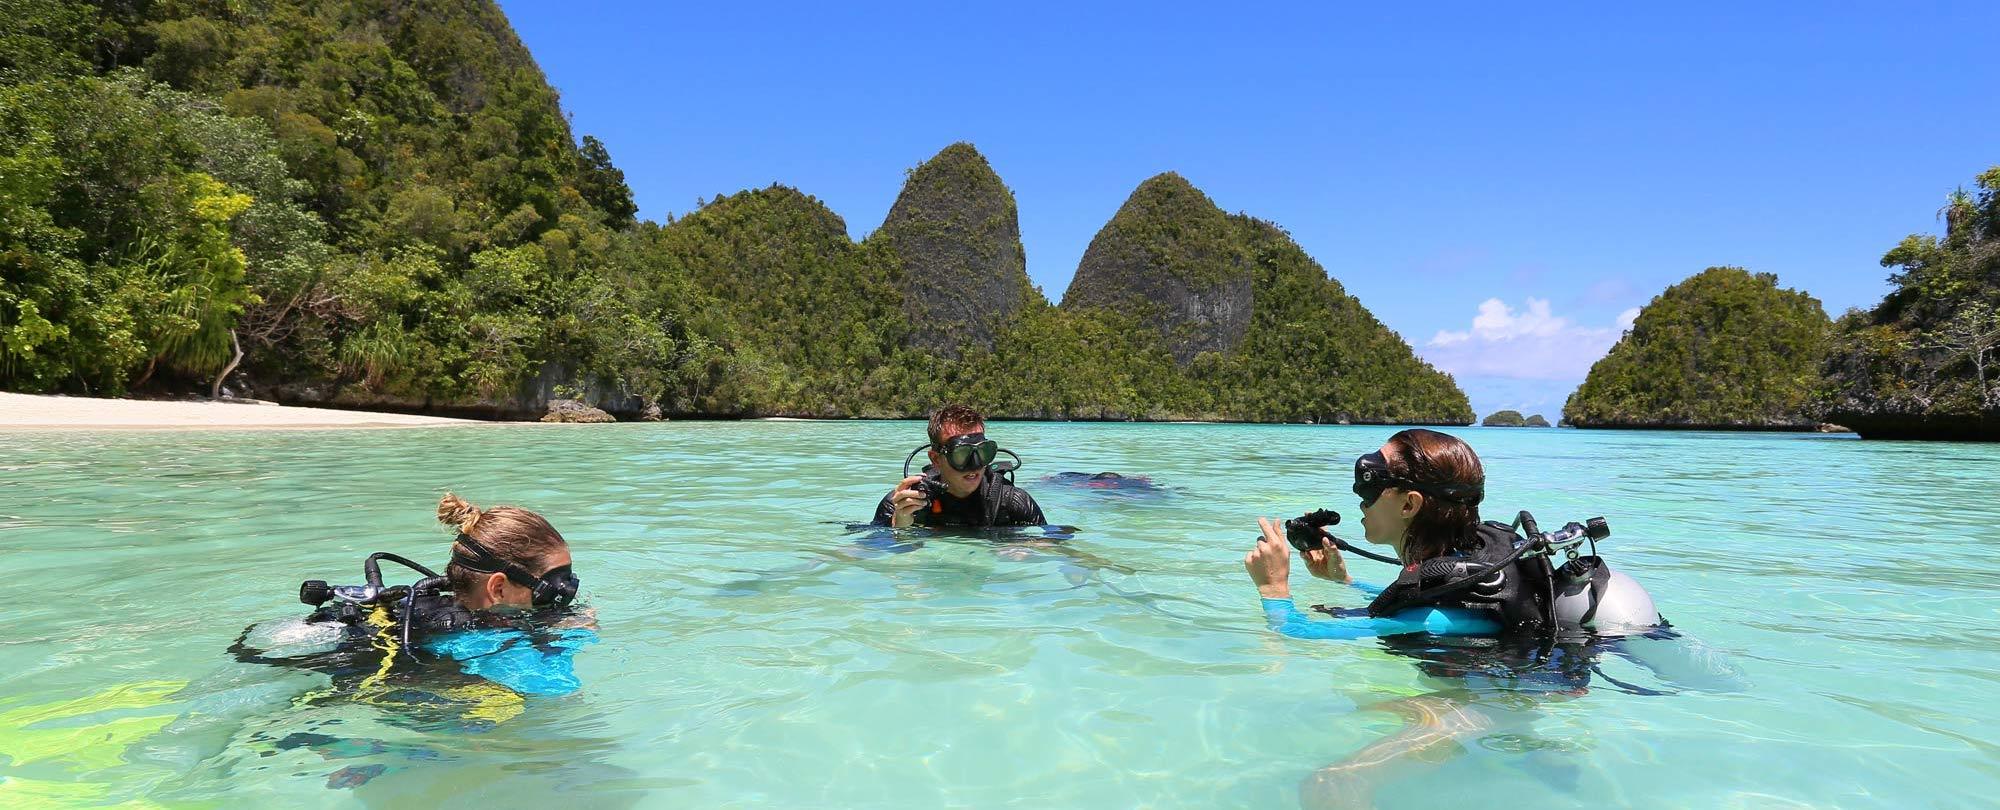 yacht charter itineraries